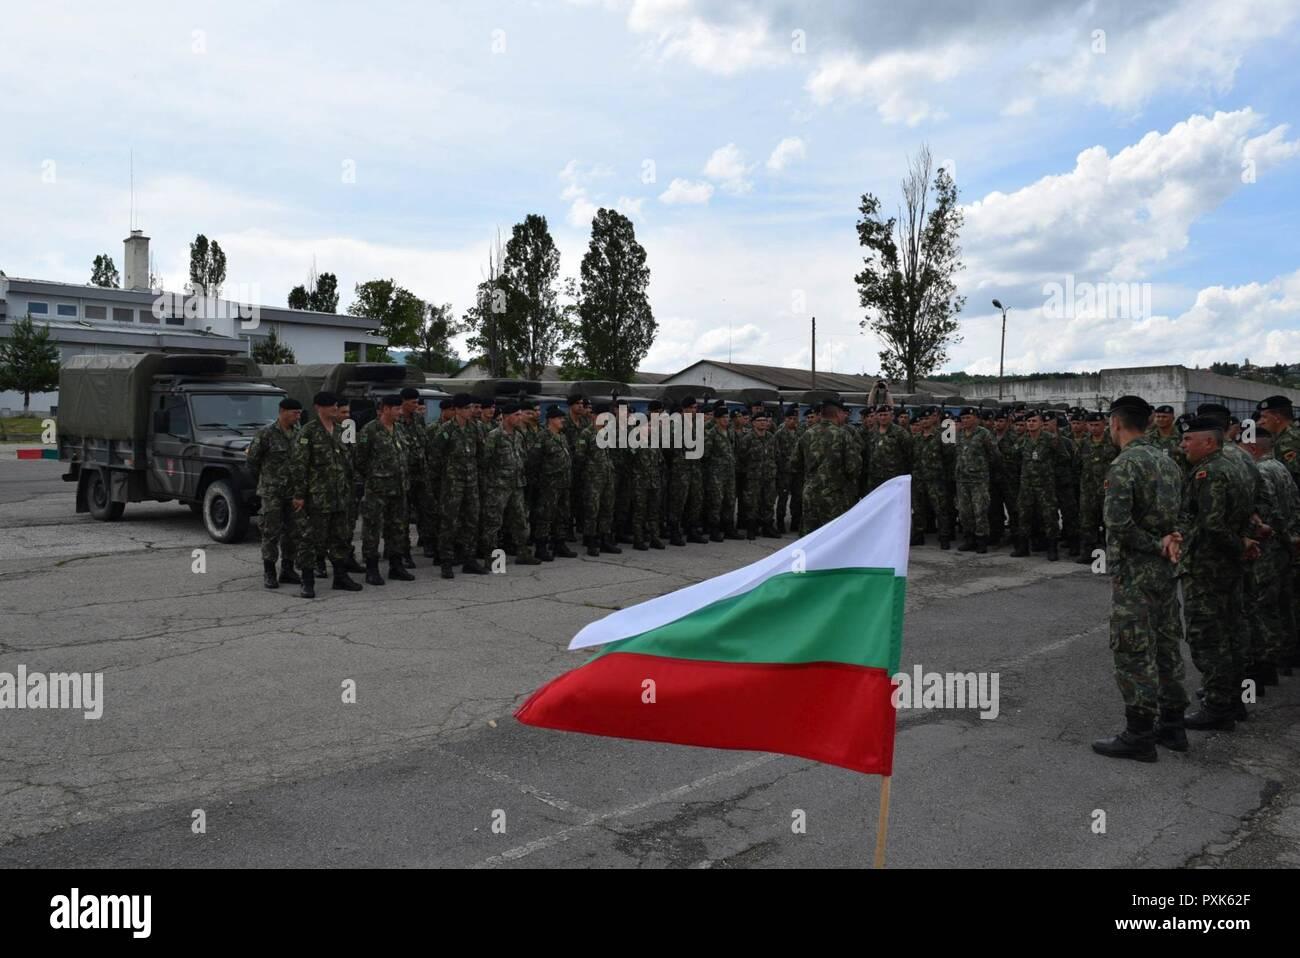 June 3, 2017 Sofia, Bulgaria Today, the Albanian contingent